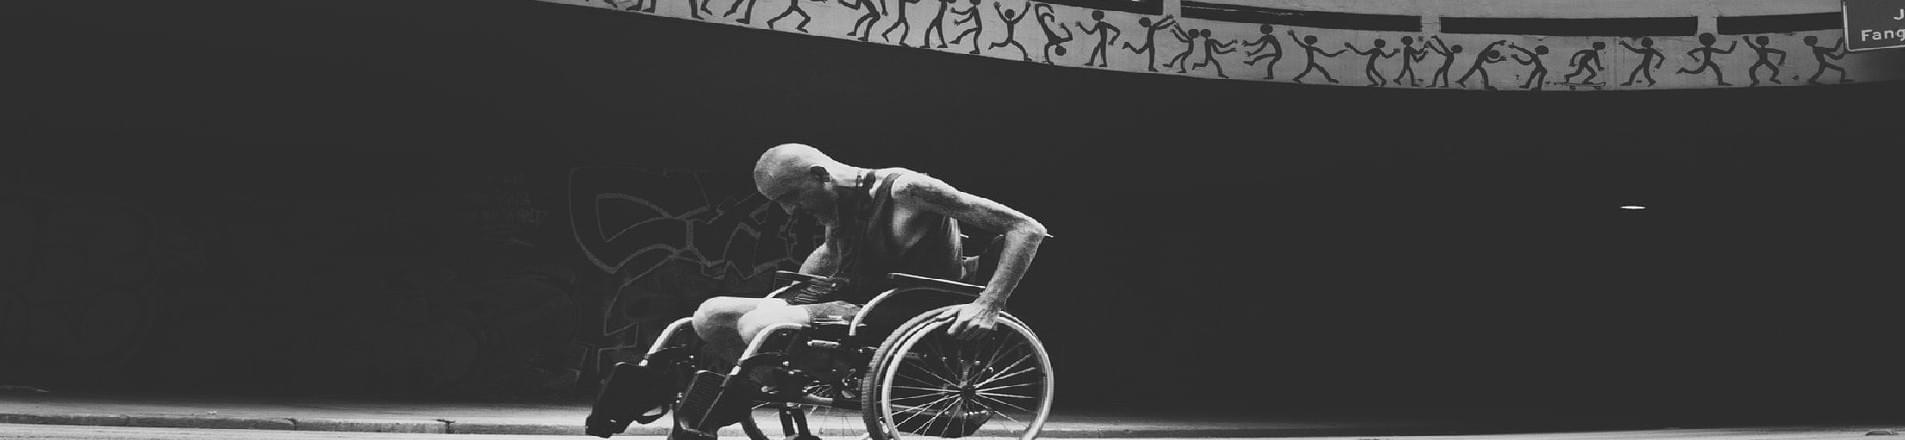 Defining Disability in Denmark